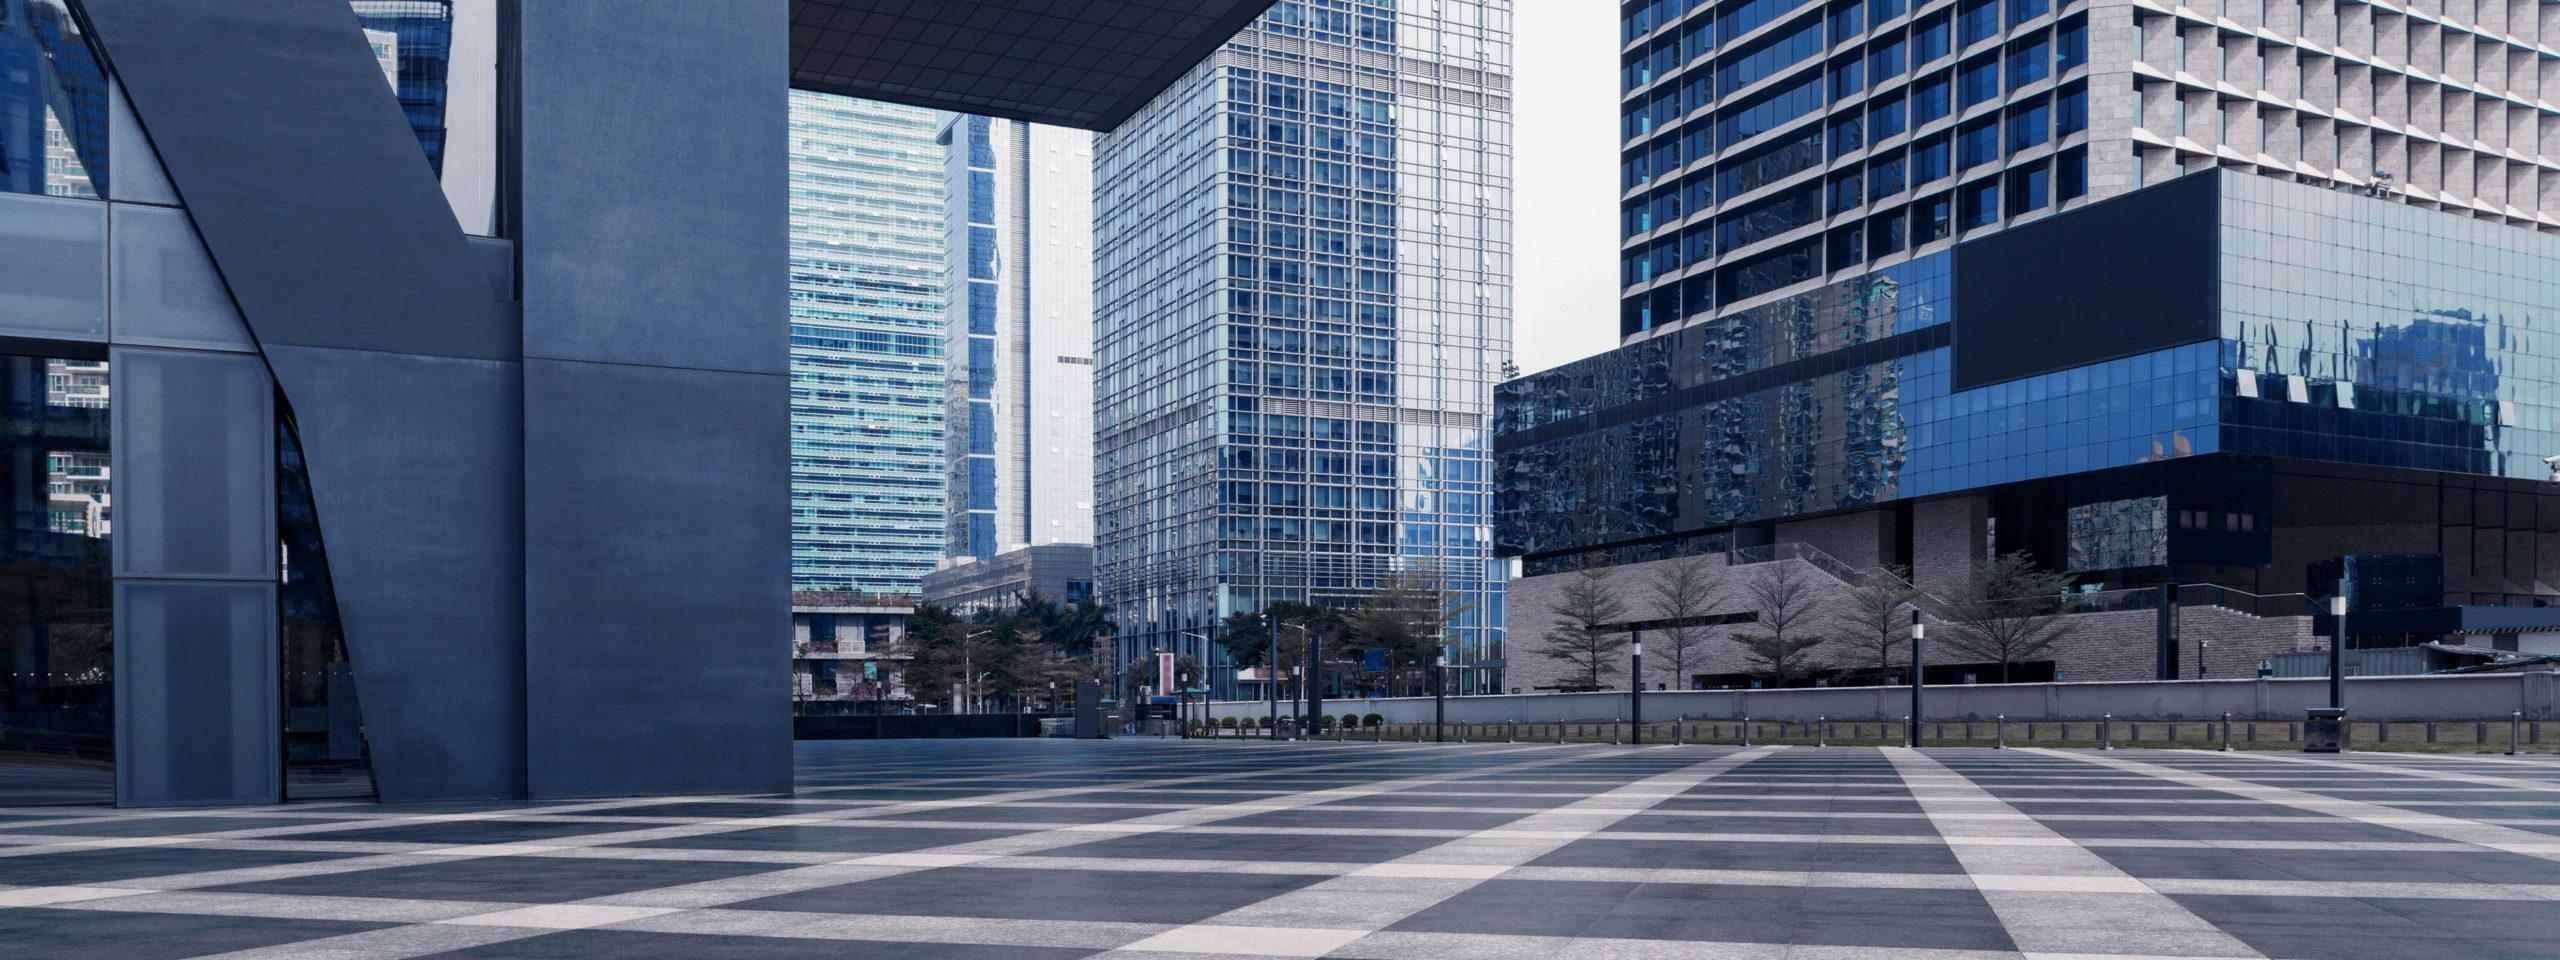 Empty street in front of large office buildings ©fuyu liu, shutterstock.com